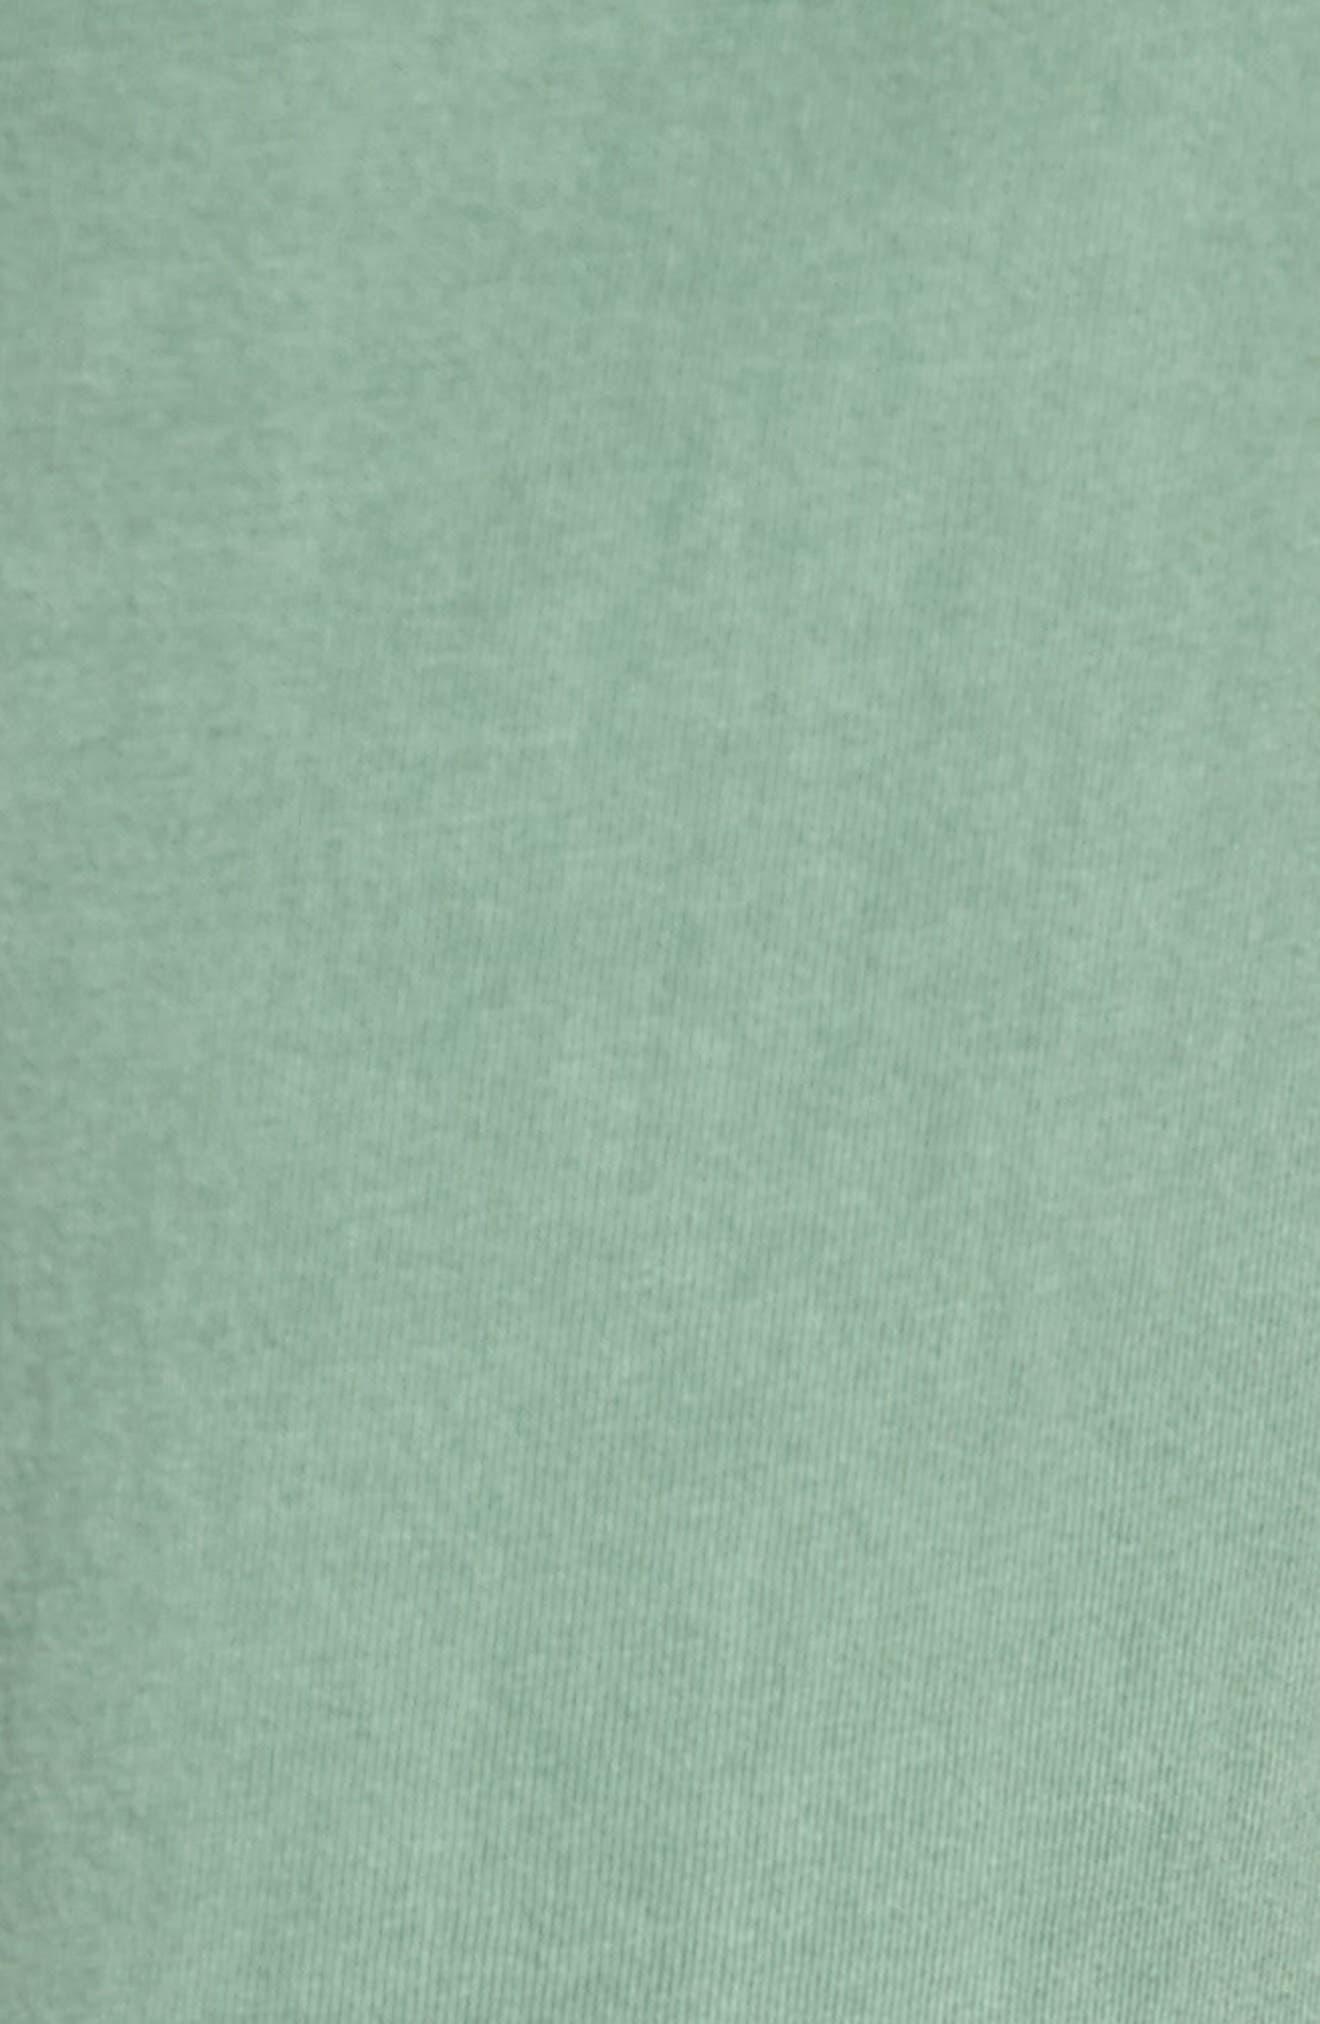 Peruvian Pima Cotton Lounge Pants,                             Alternate thumbnail 5, color,                             MOSS